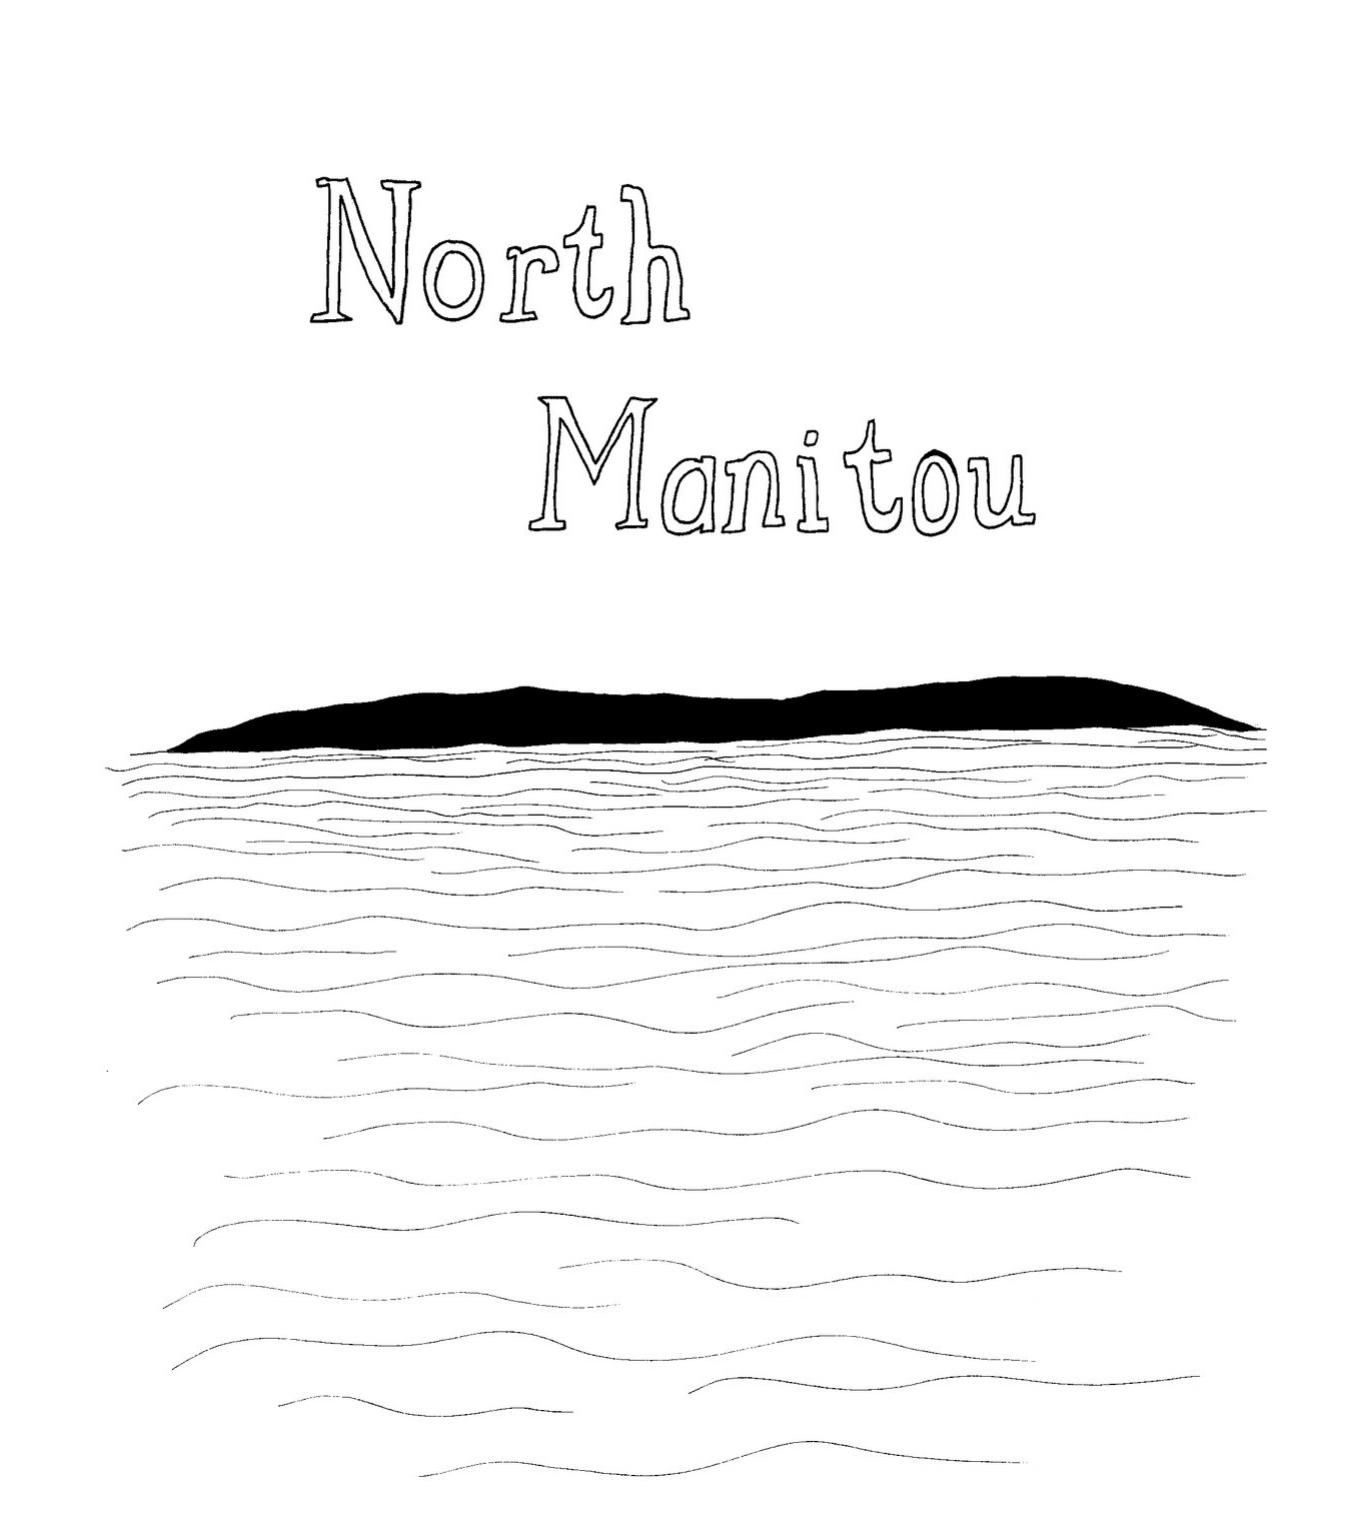 North Manitou Michigan - rebecca mir grady